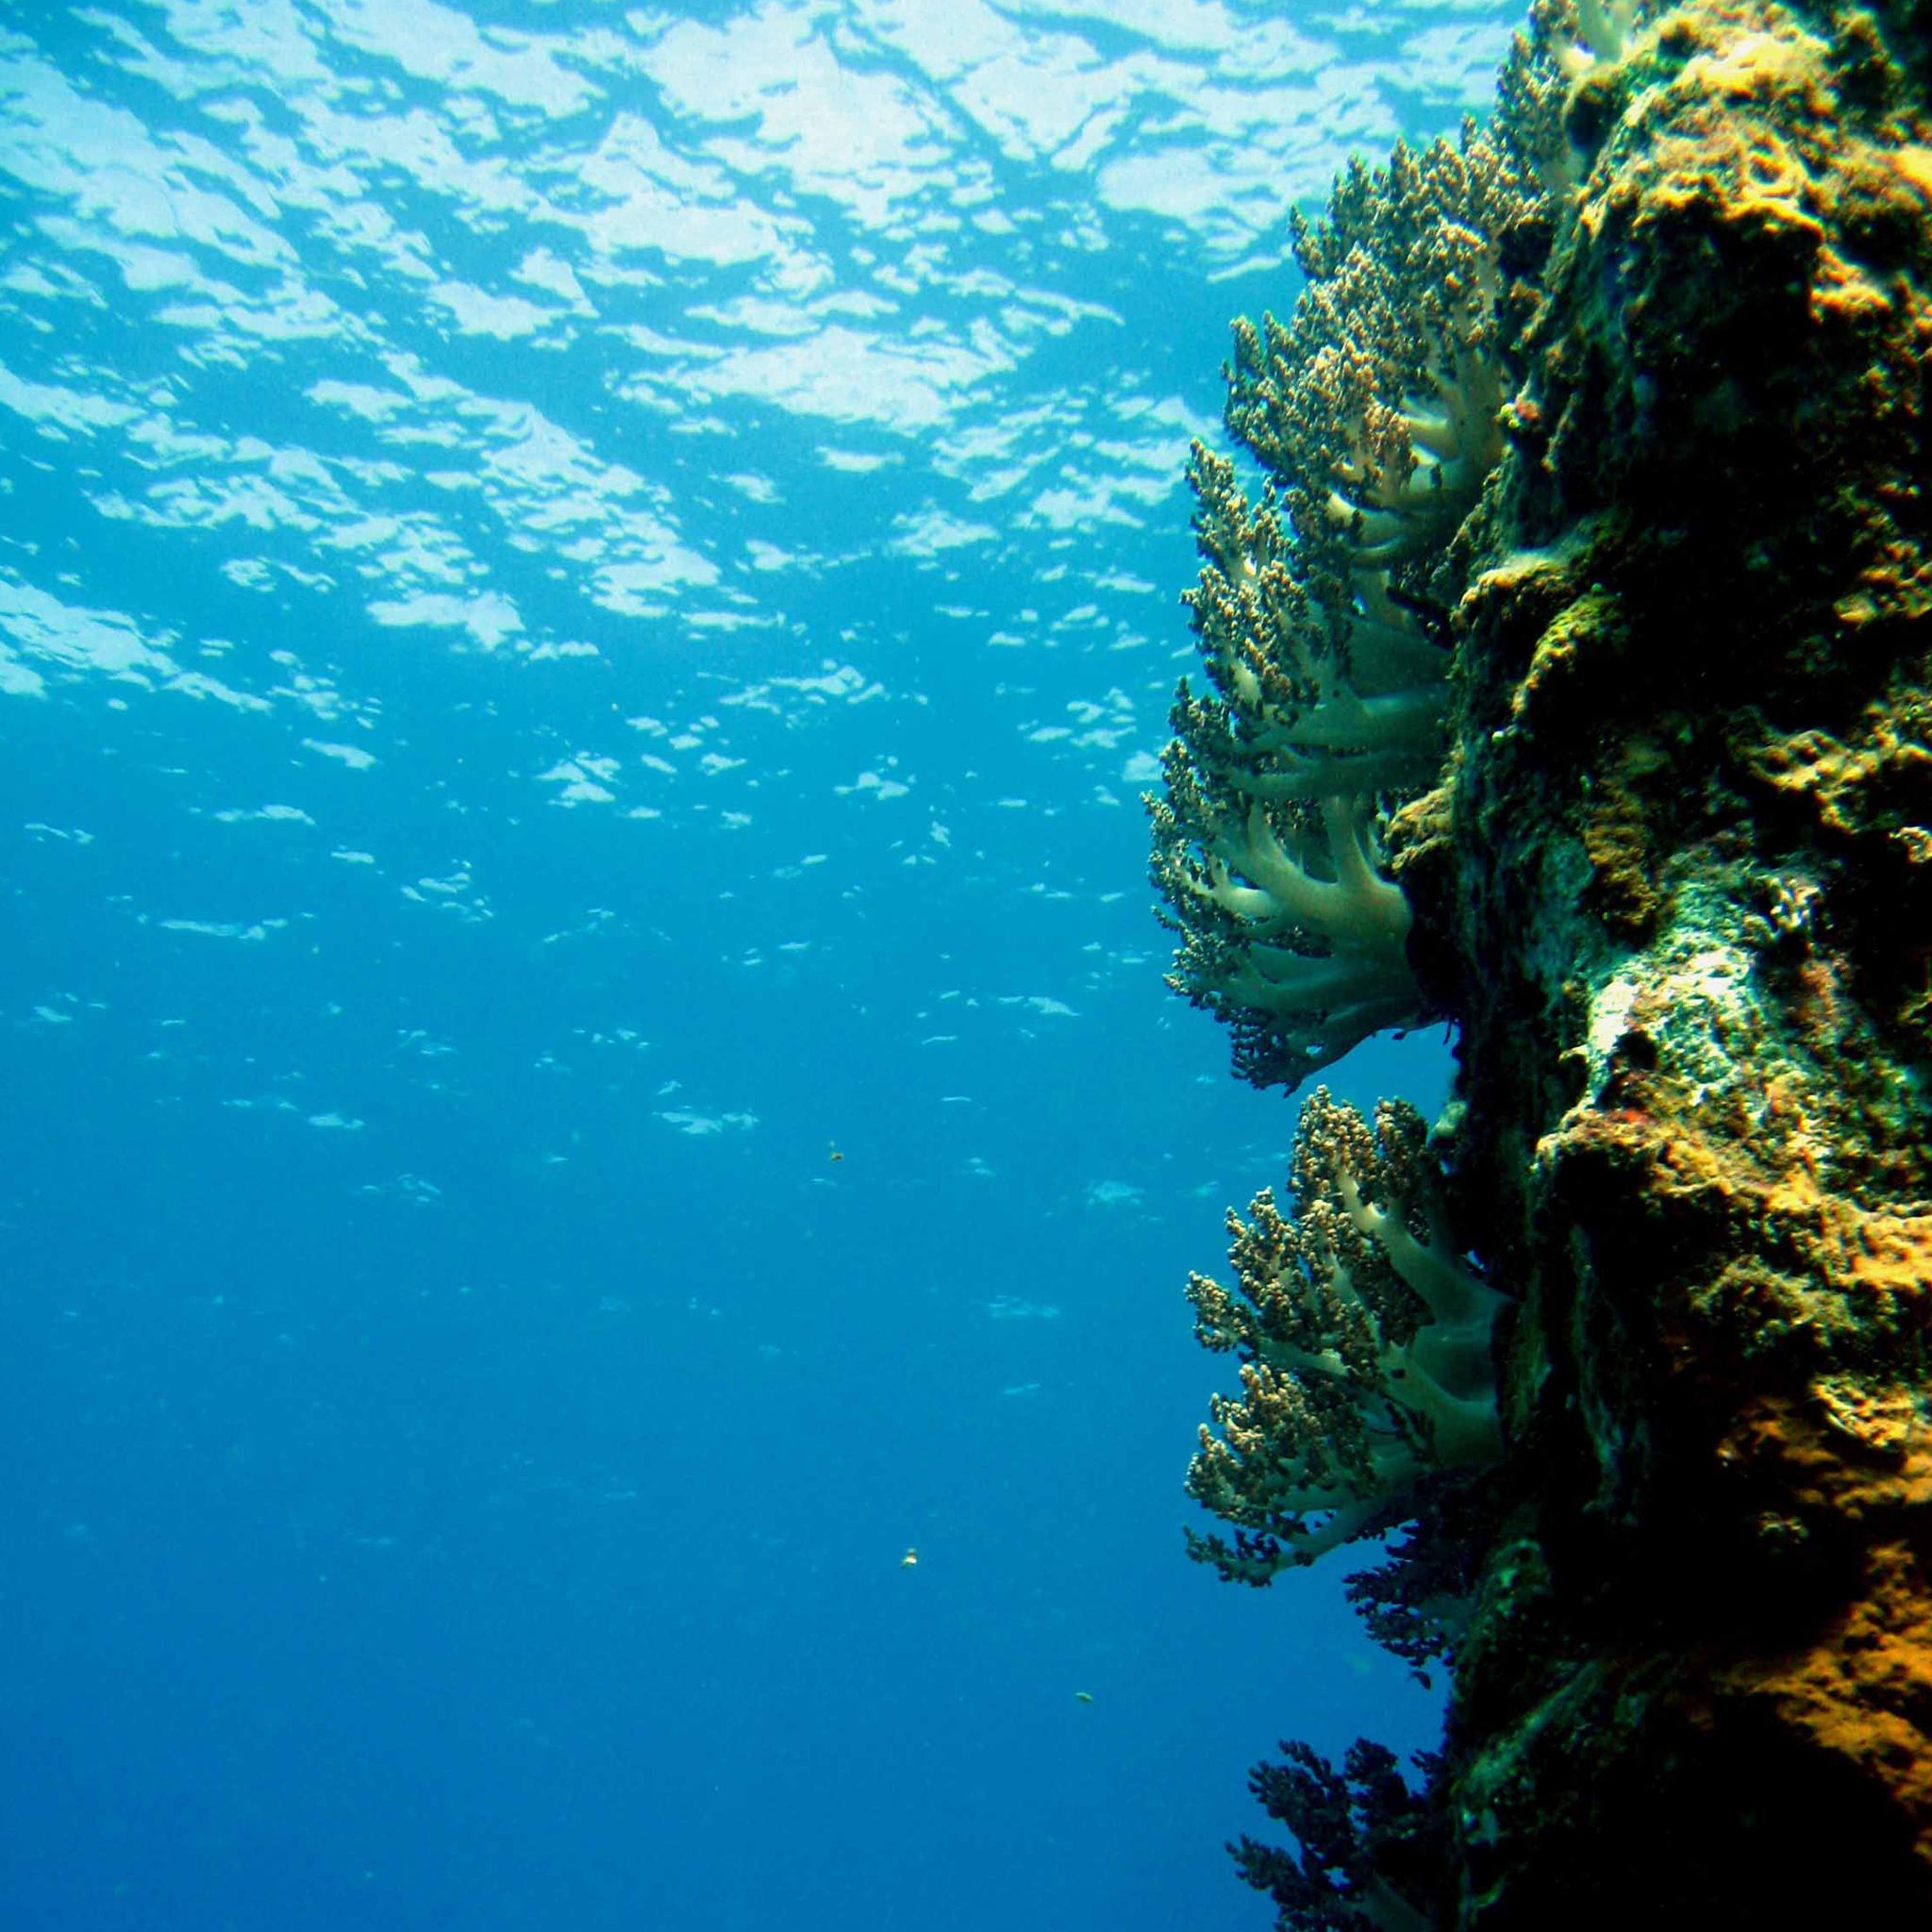 Ocean-Diving-3Wallpapers-iPad-Retina